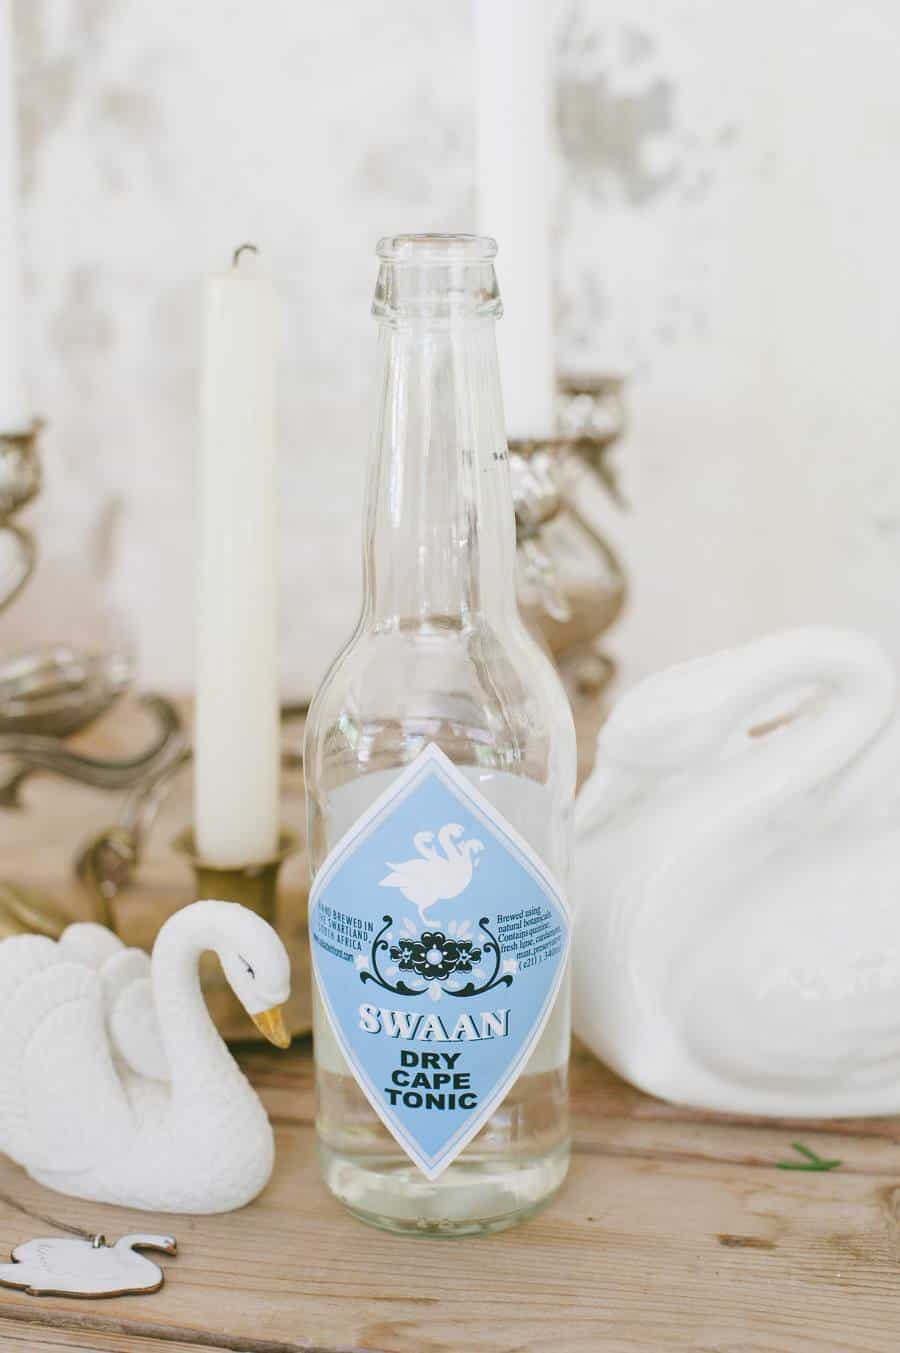 Swaan Cape Dry Tonic